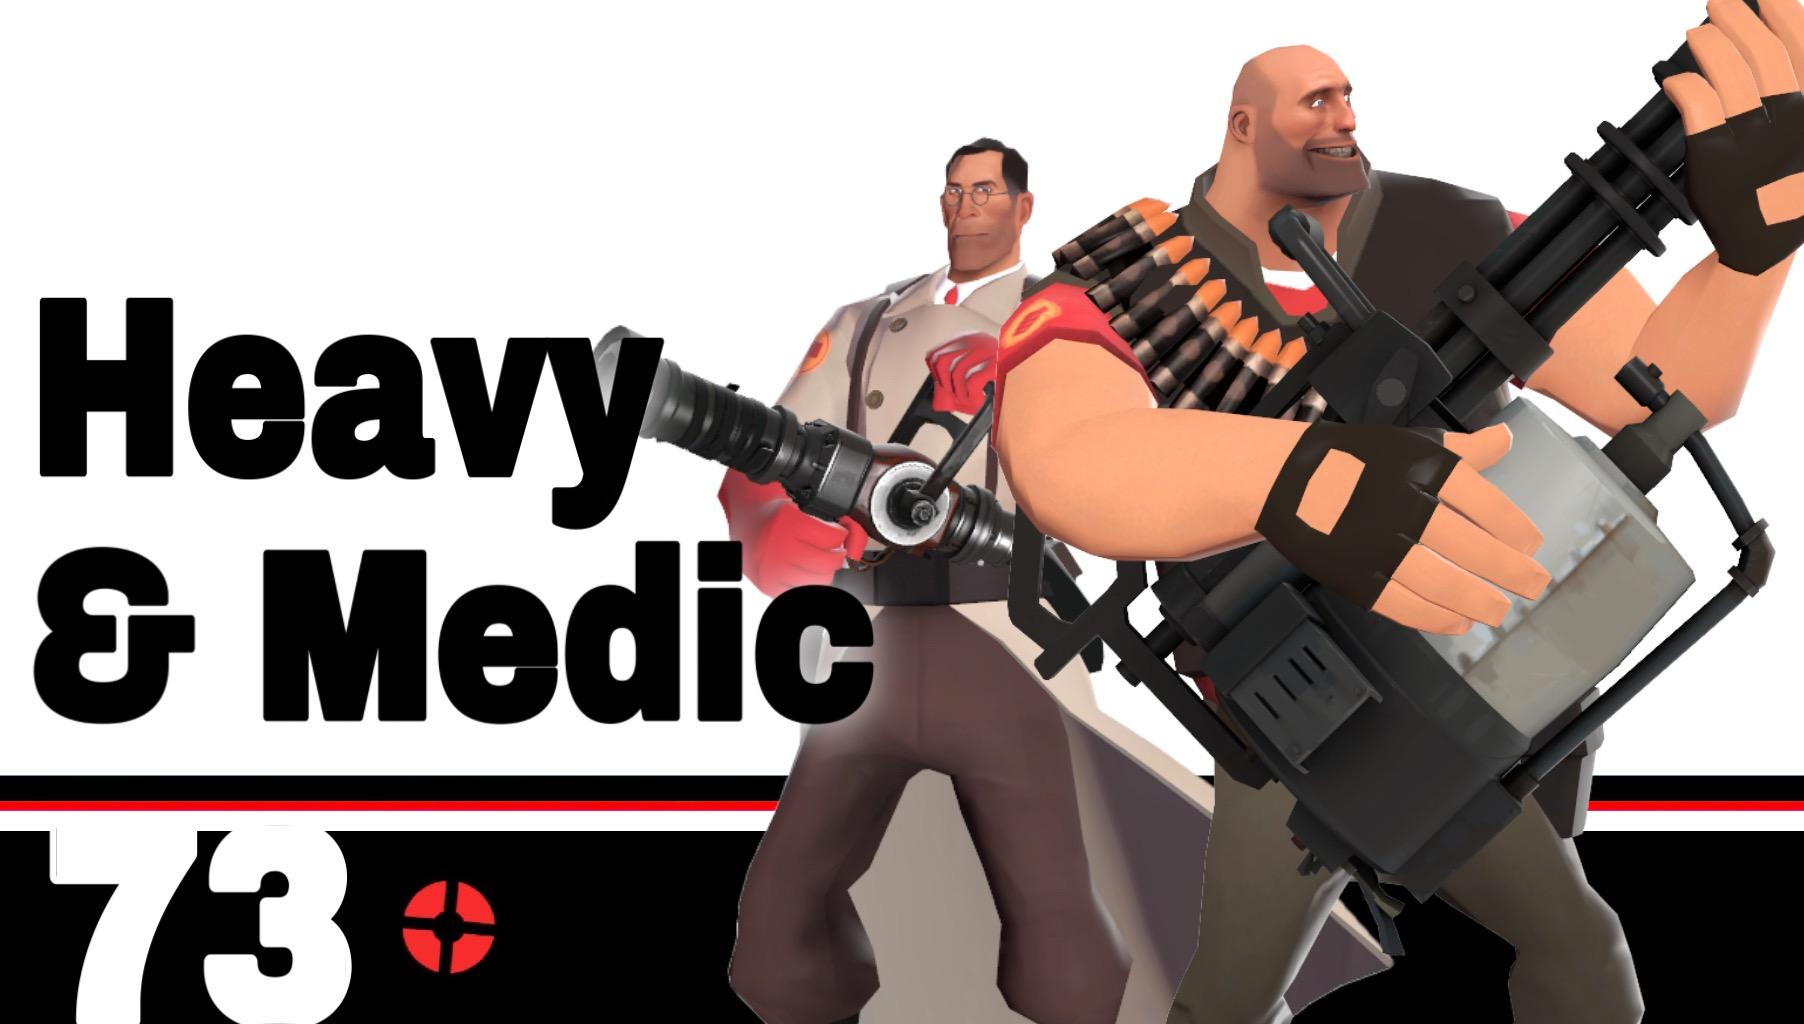 Heavy & Medic Smash Bros Splash Screen.jpg